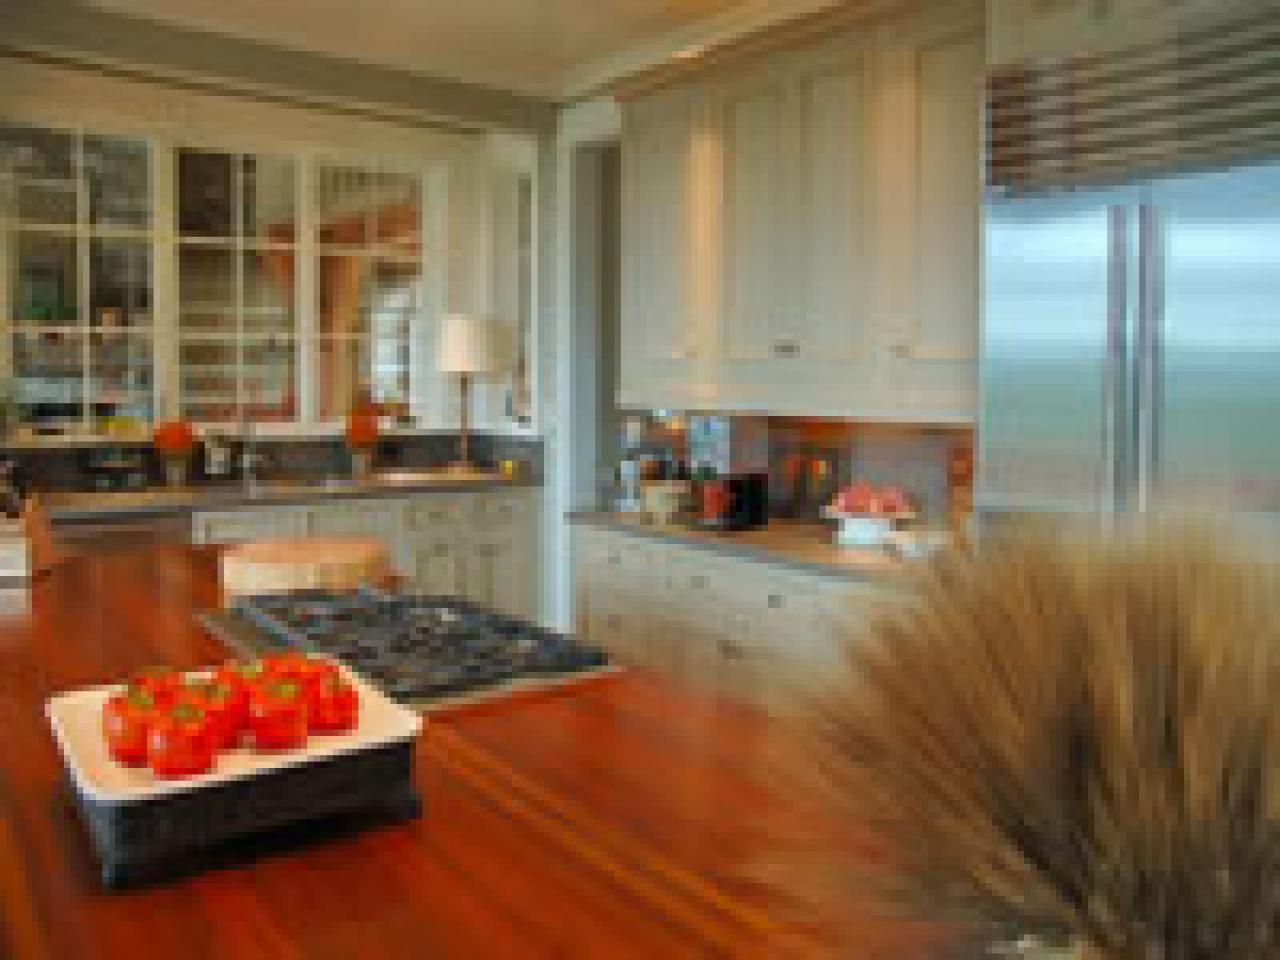 kitchen design mistakes. How To Avoid Kitchenrk 1 How Avoid The Biggest Kitchen Mistakes  HGTV